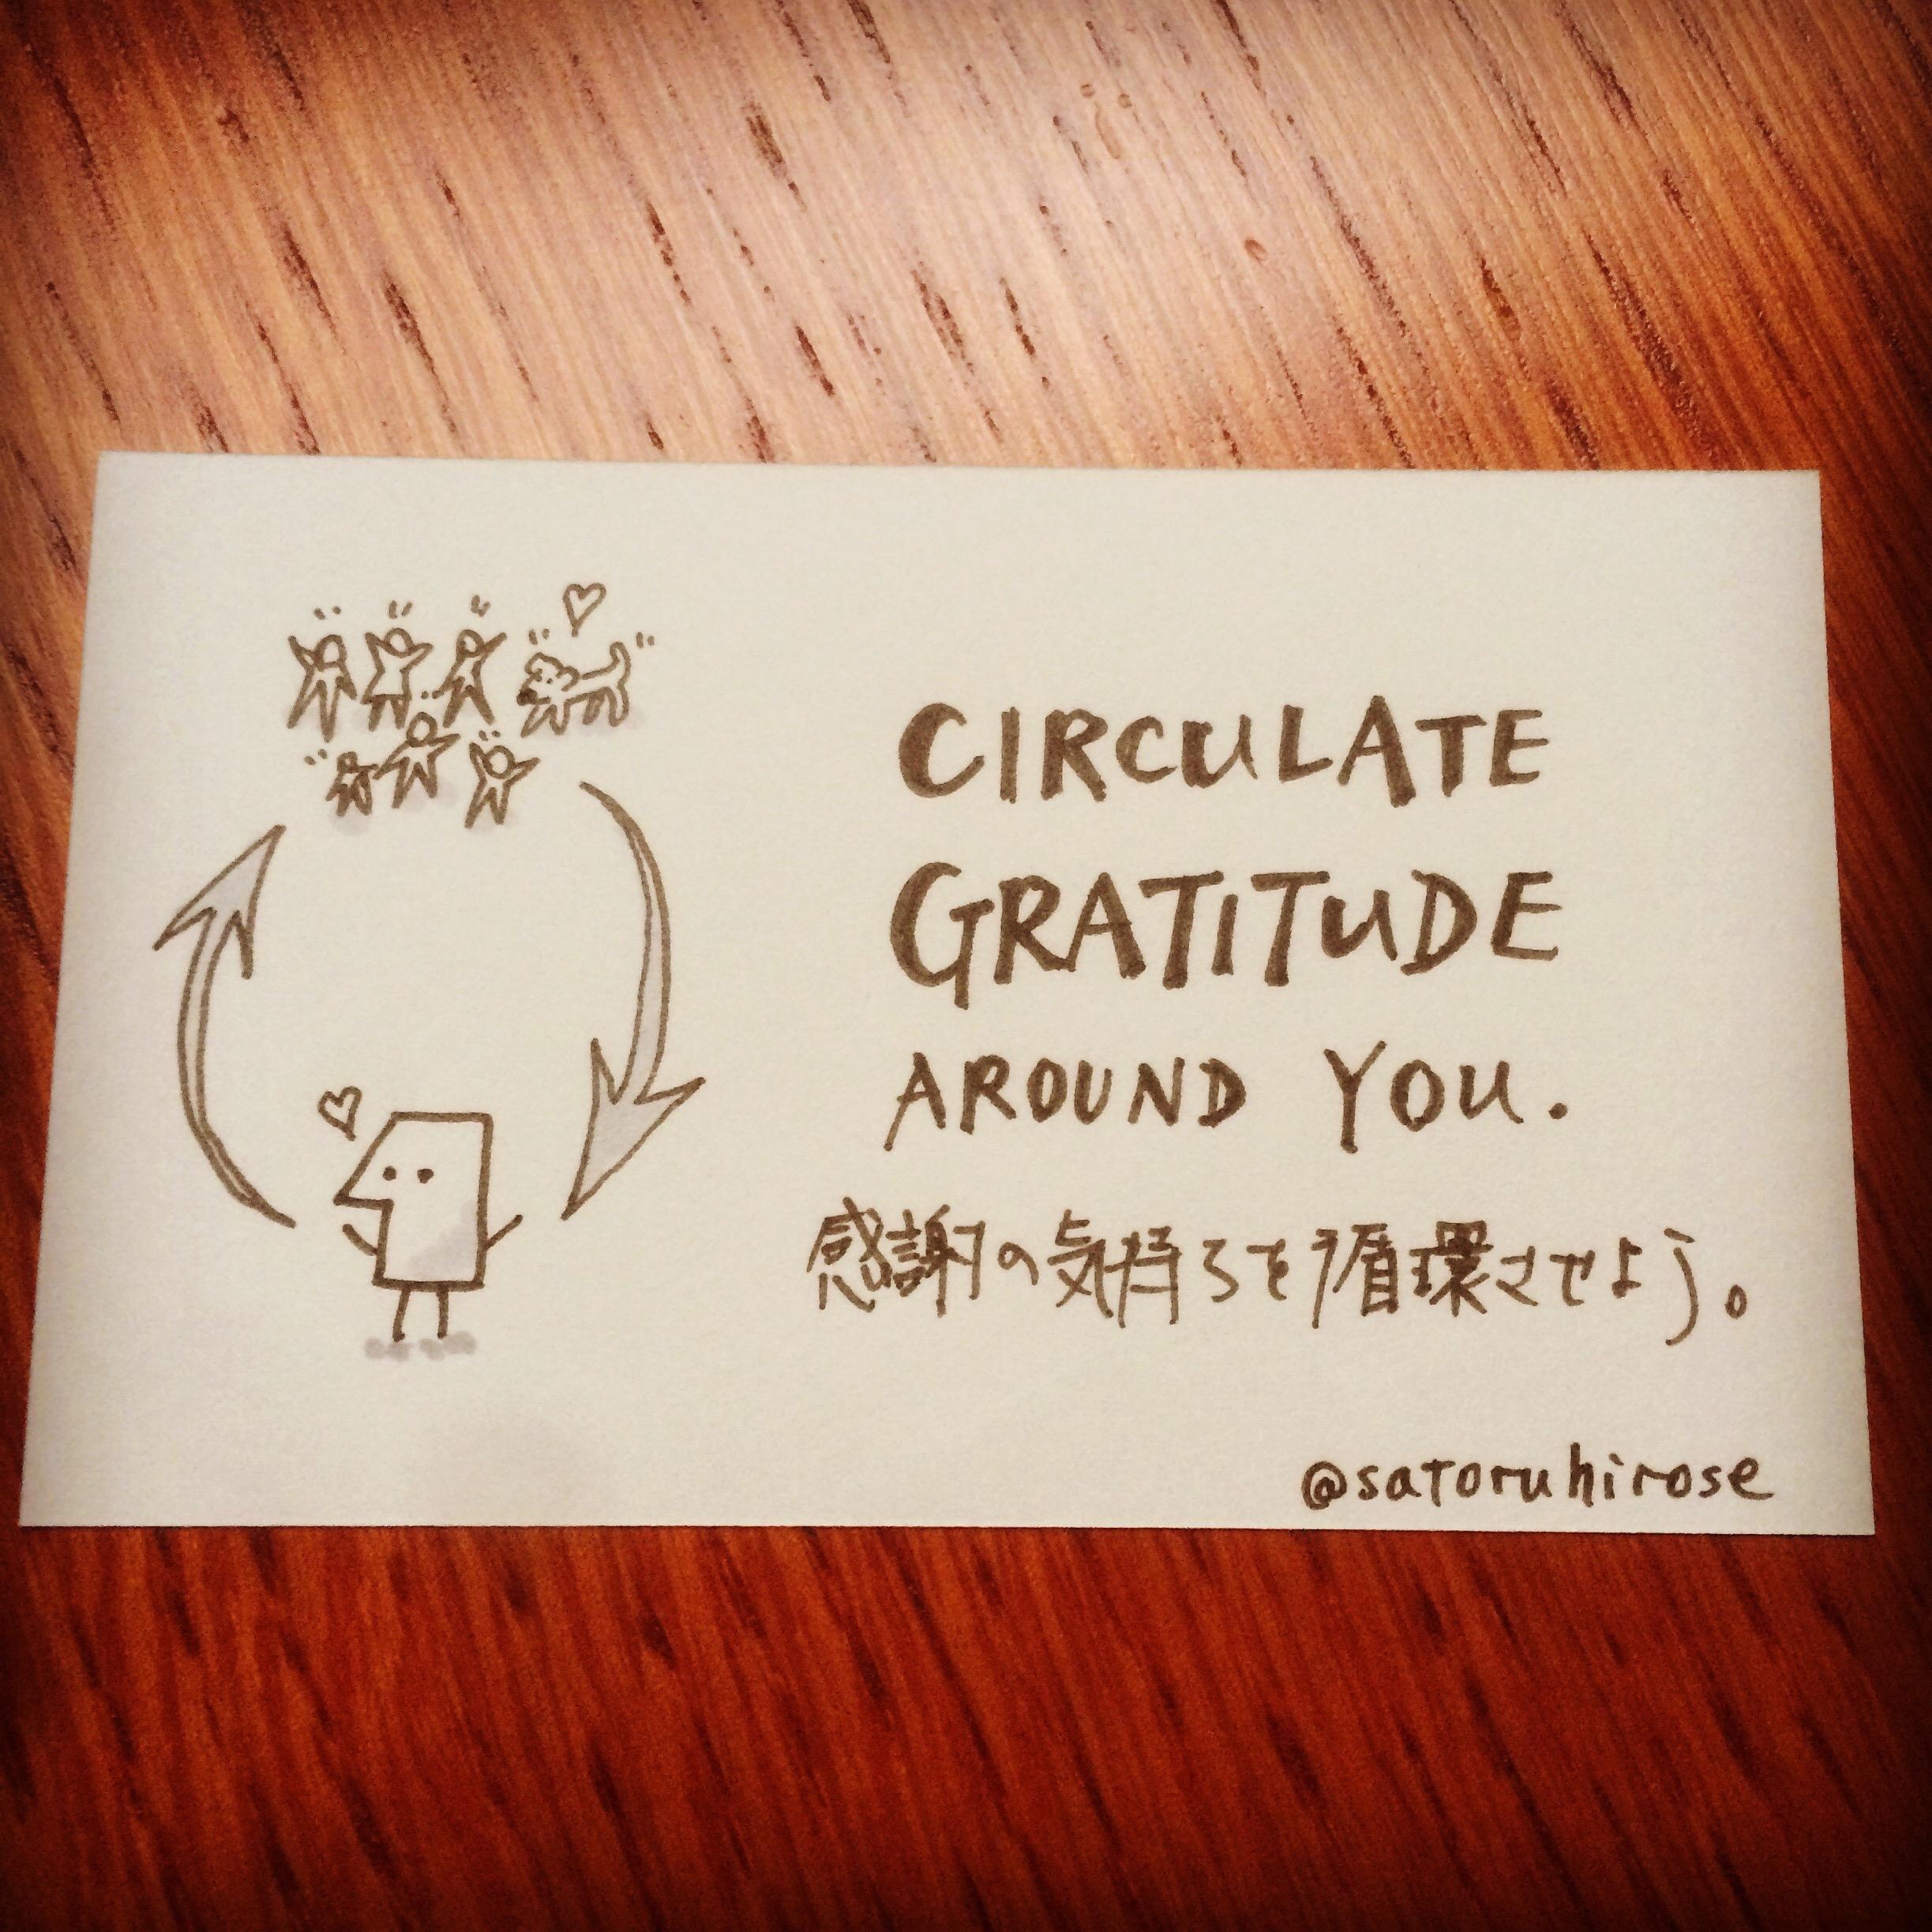 Circulate gratitude around you.